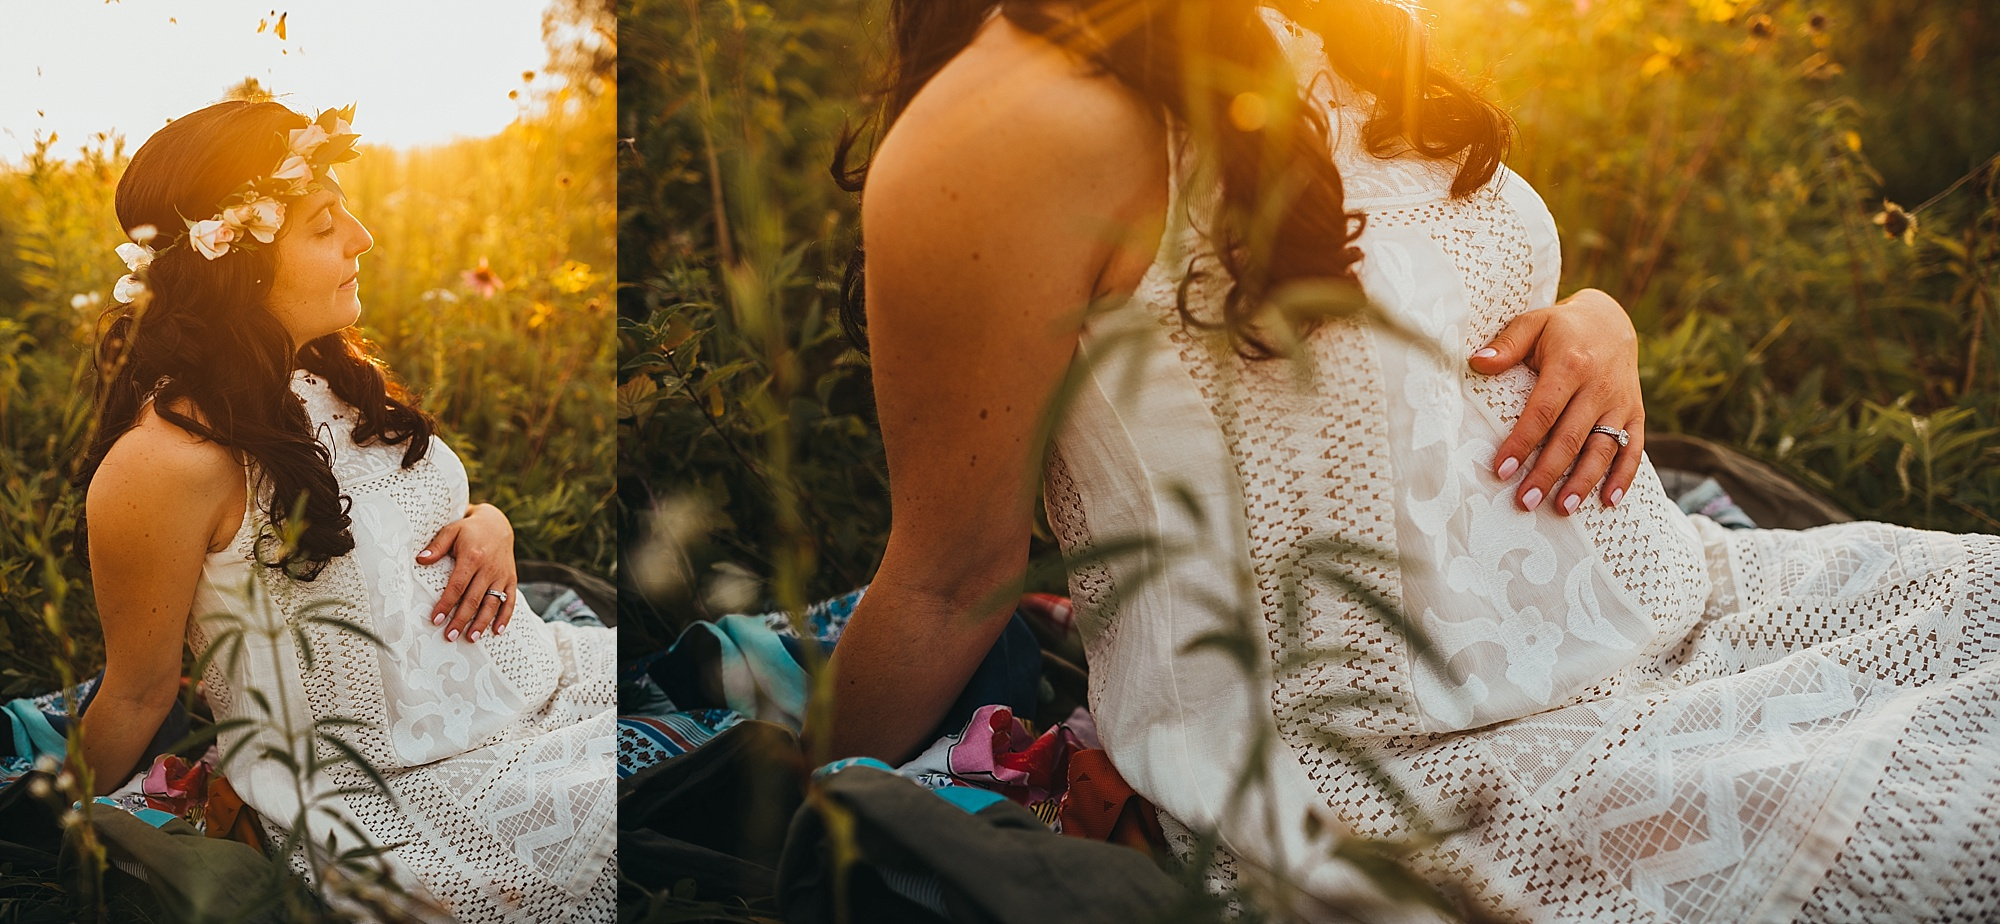 lauren-grayson-photography-cleveland-ohio-photographer-maternity-summer-outdoor-bohemian-fields-session_0497.jpg